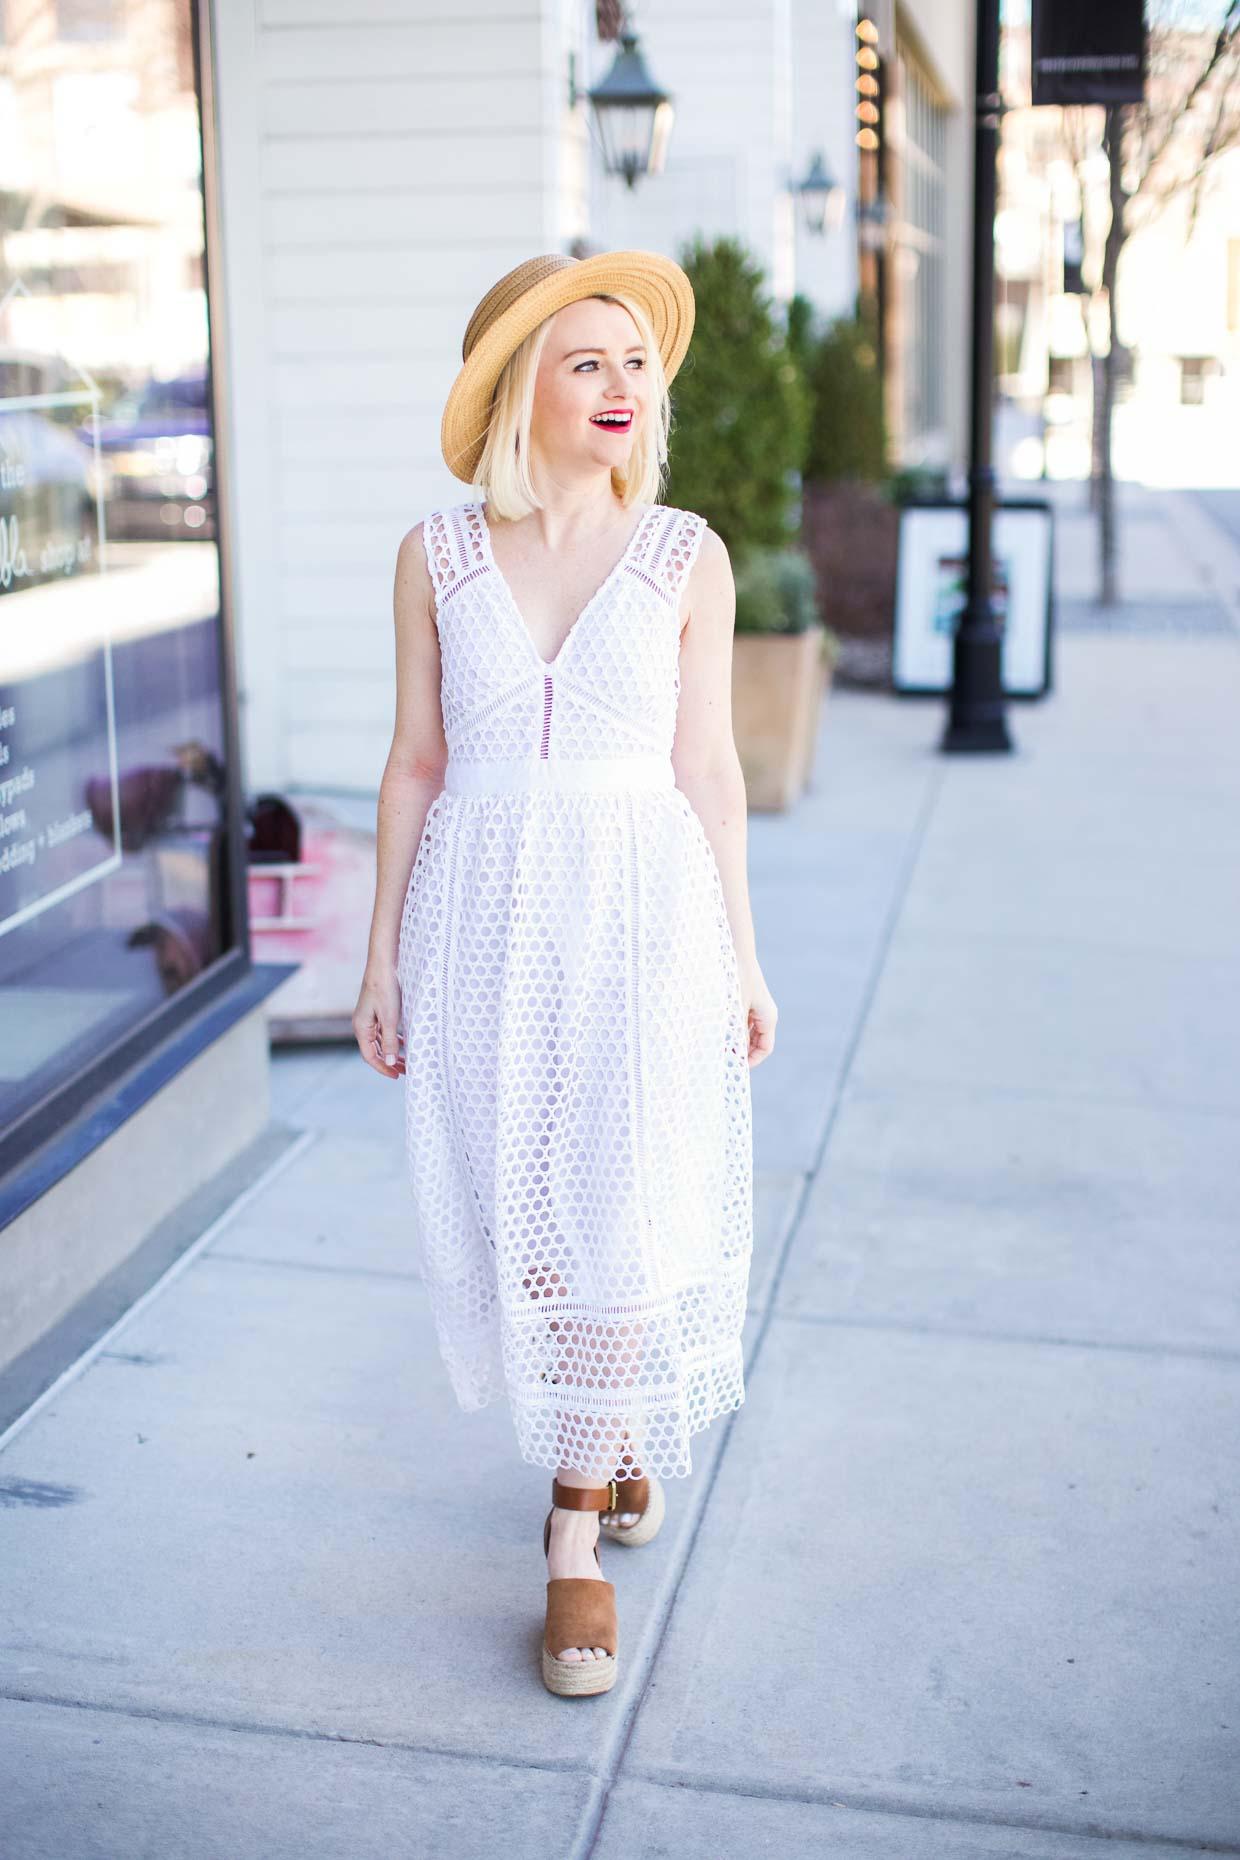 White Lace Midi Dress - Poor Little It Girl